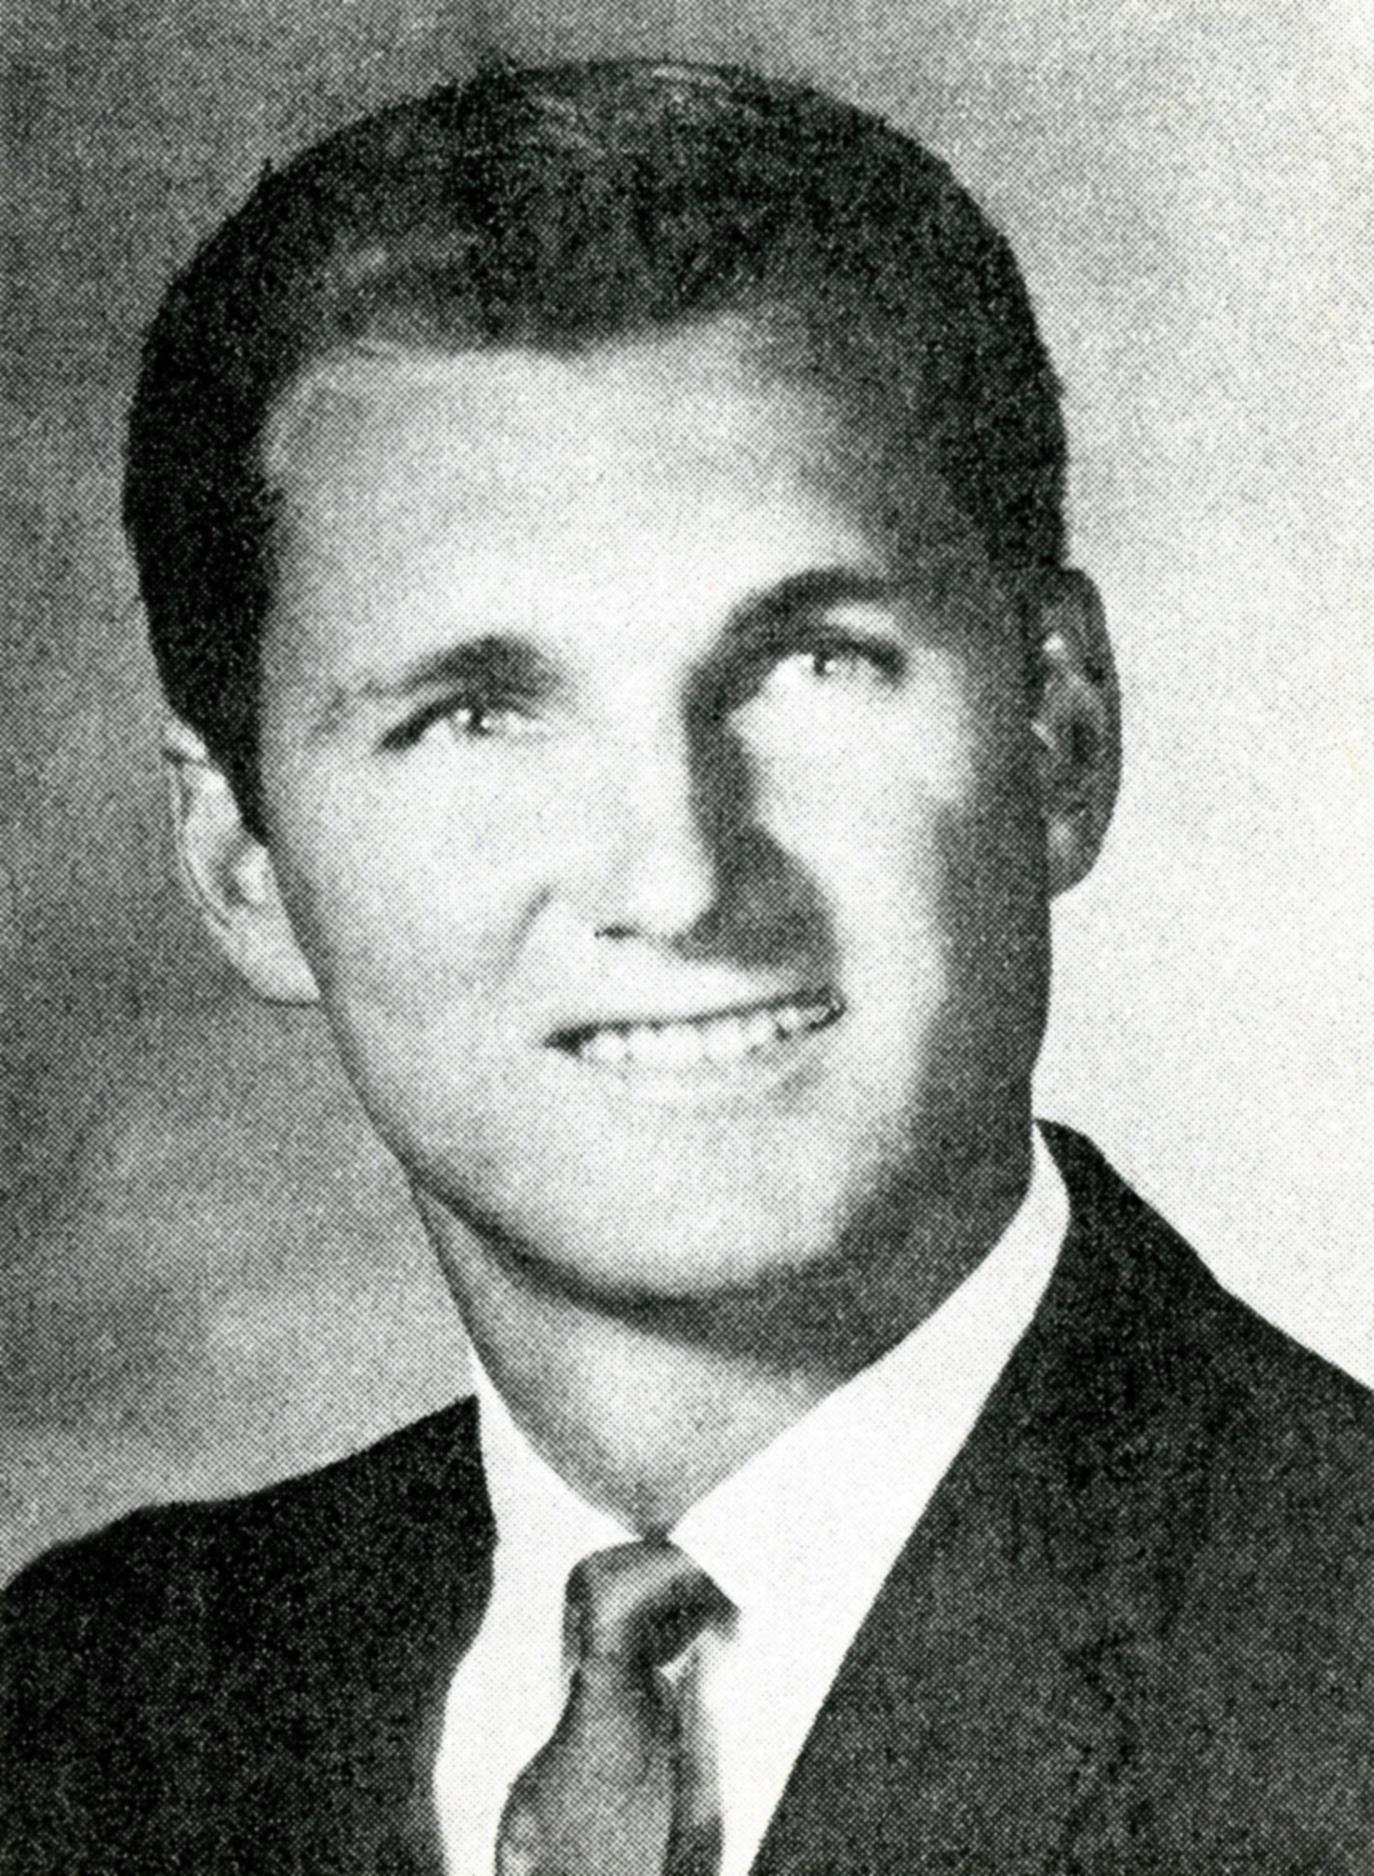 Robert Boyd (1967-1968)